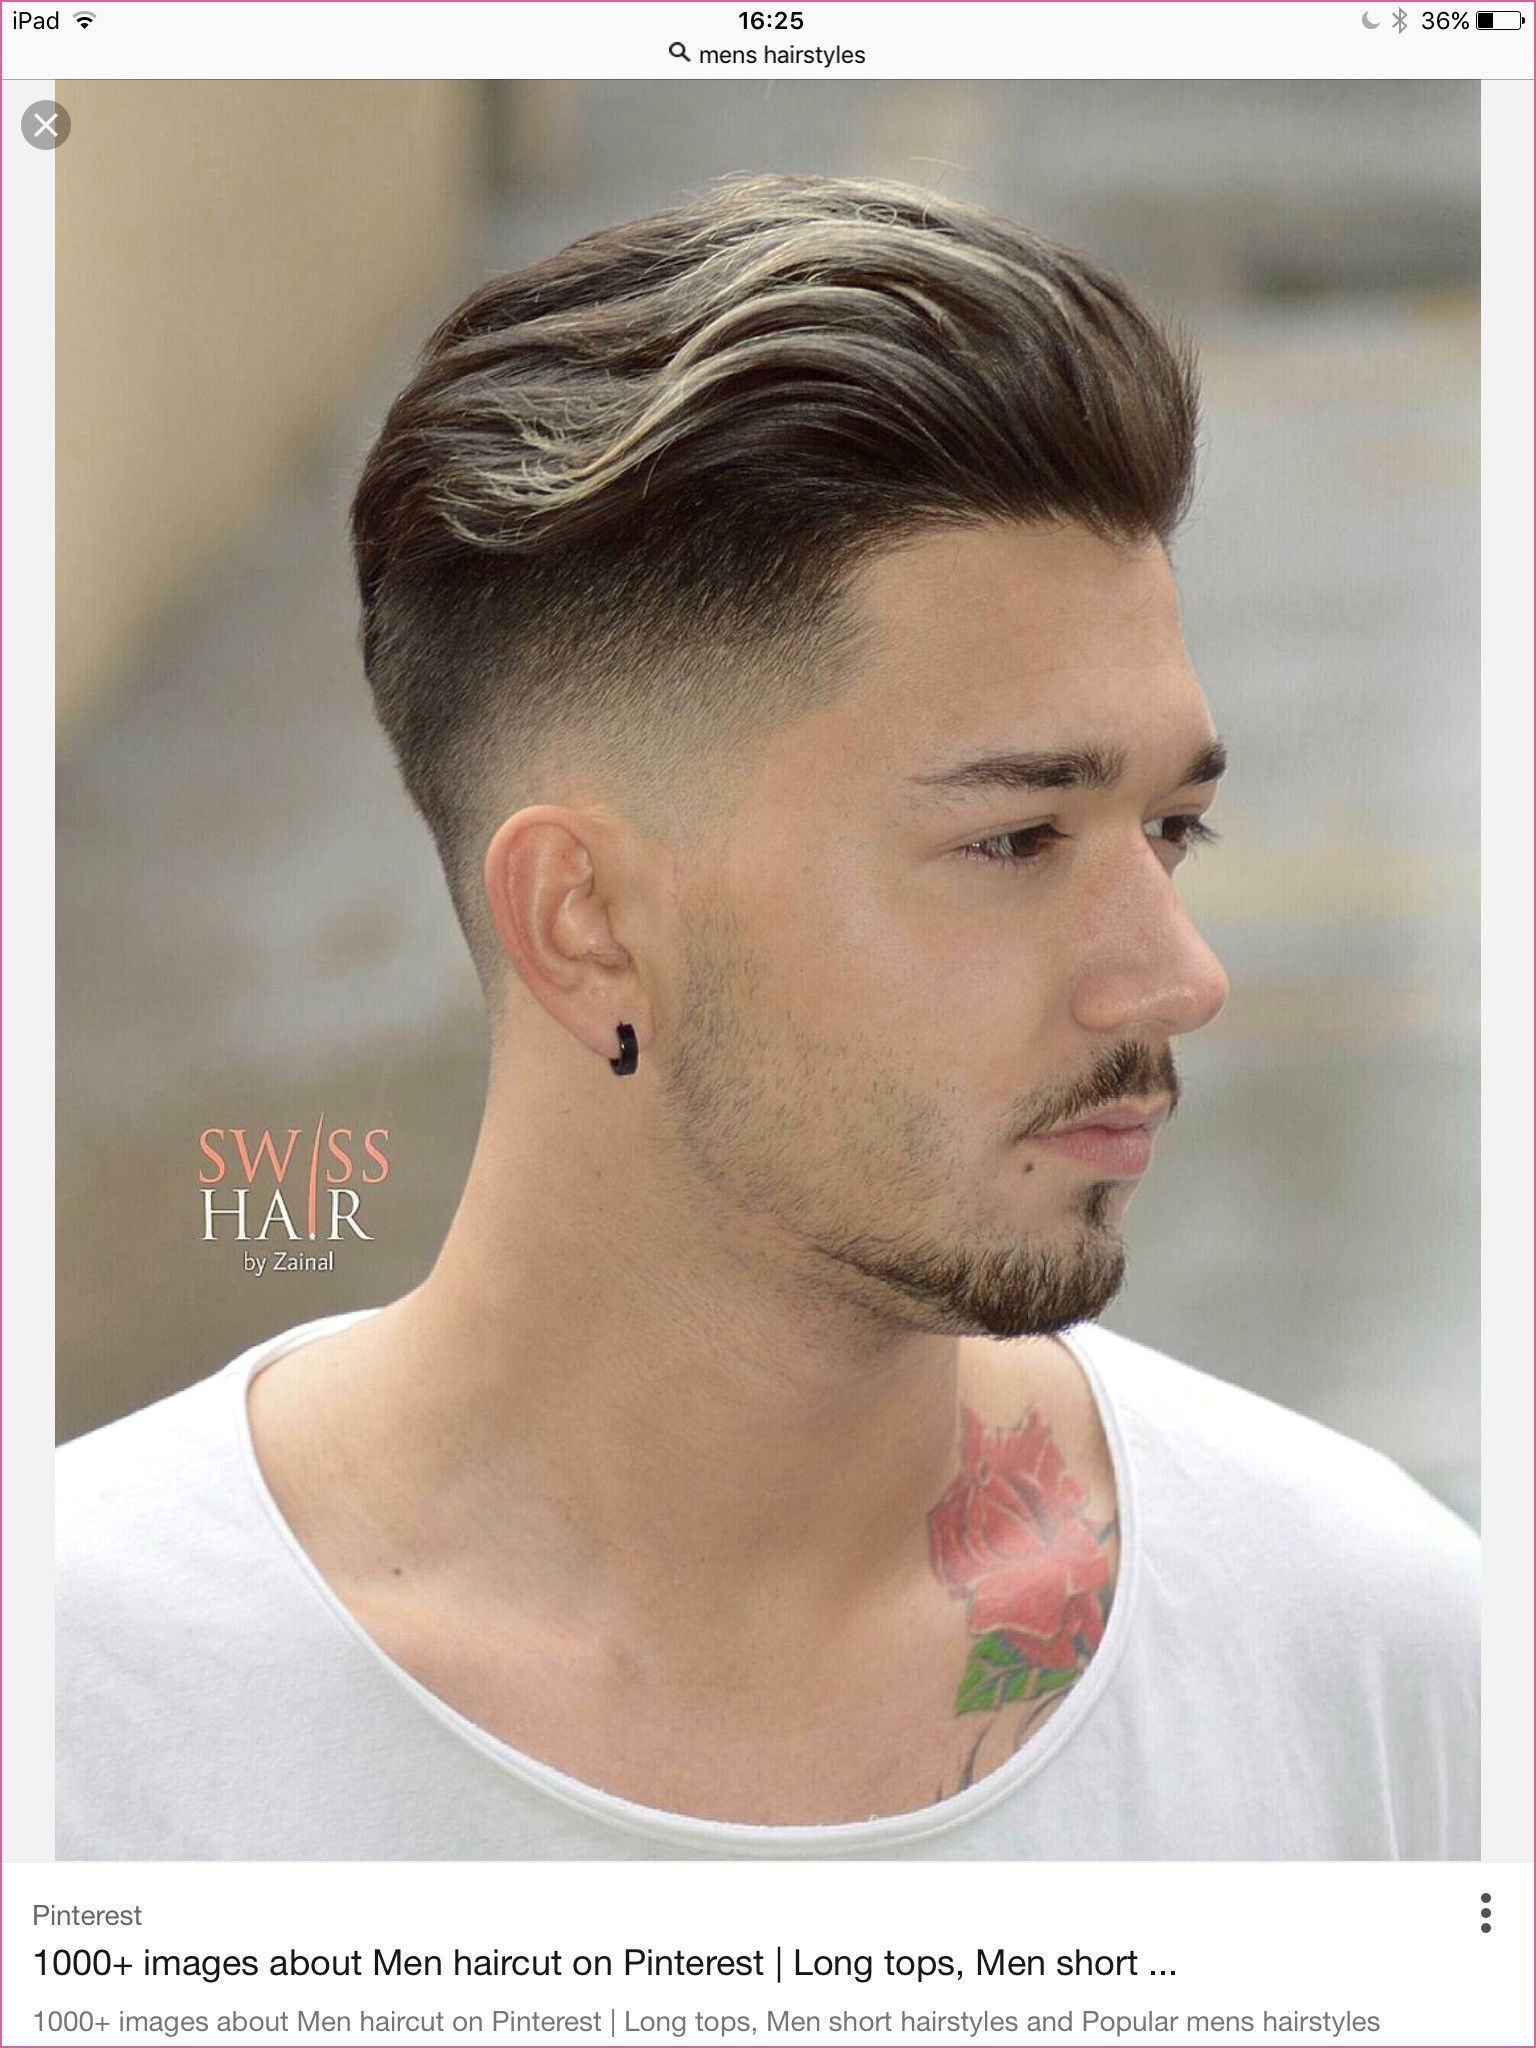 Erkeksacmodelleri Frisuren Kurzhaar Kurzhaarfrisuren Kurzhaarherren In 2020 Haarschnitt Manner Manner Frisur Kurz Haar Frisuren Manner